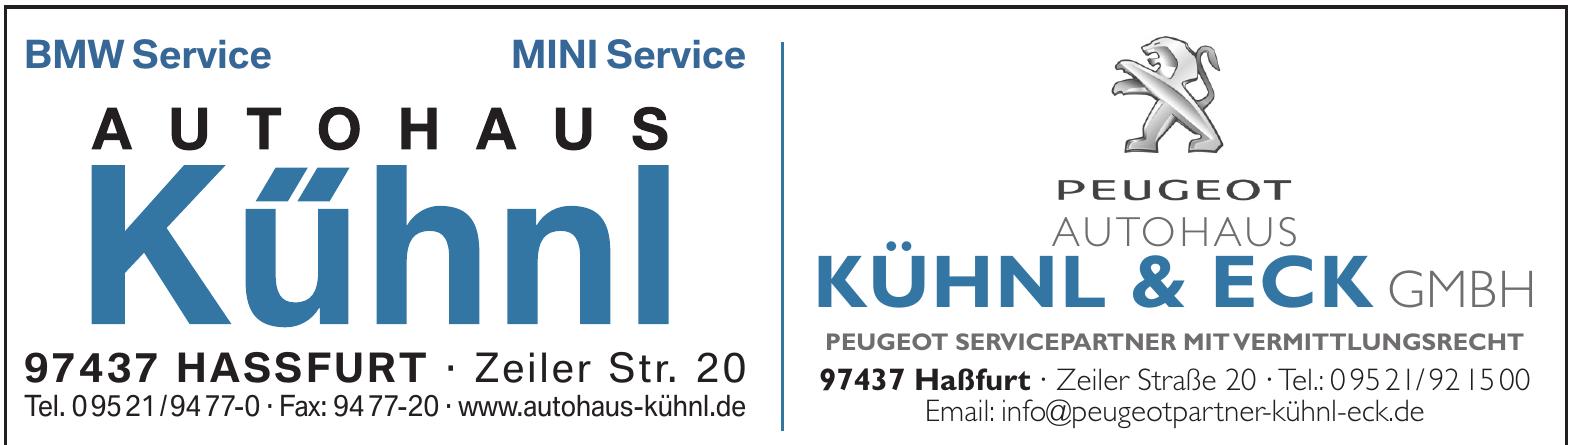 Autohaus Kühnl & Eck GbmH